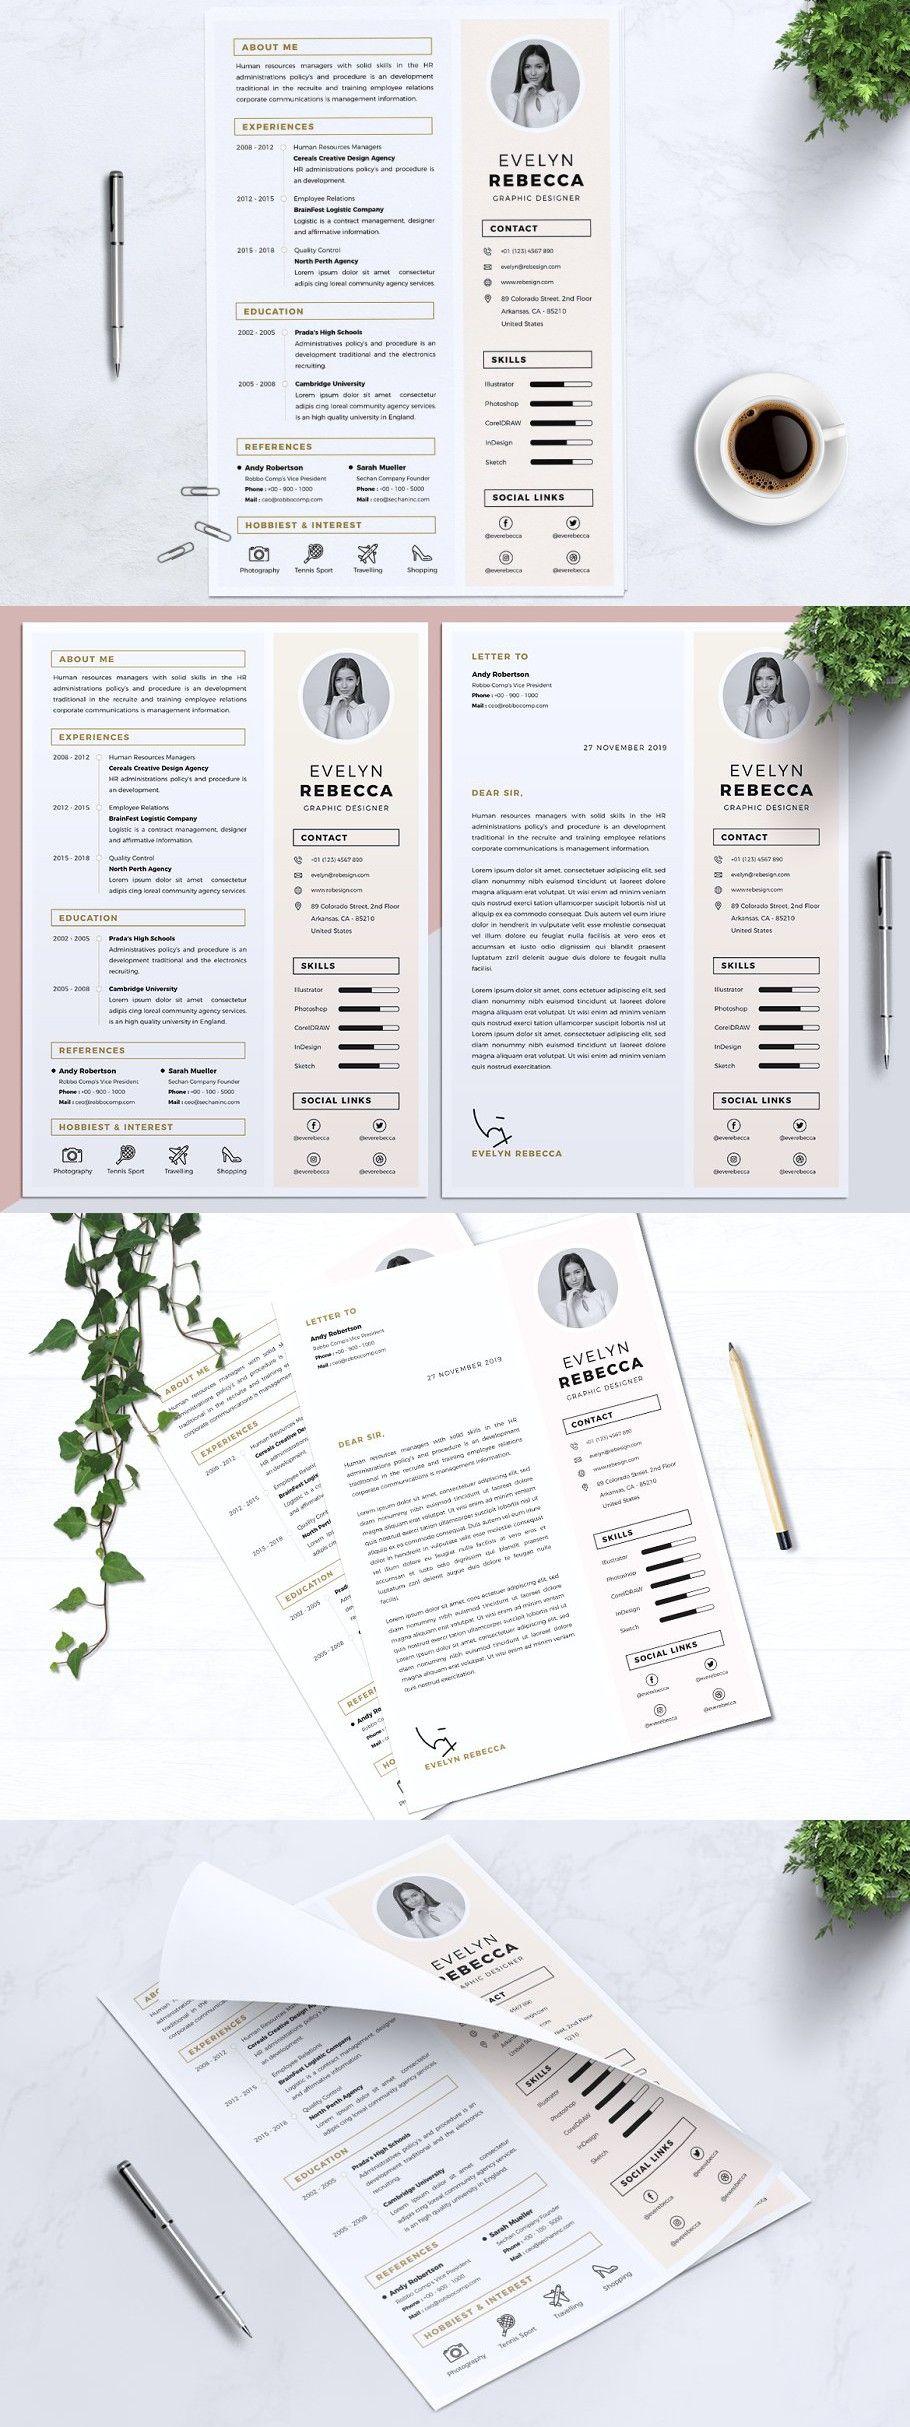 Minimalist CV Resume Vol. 03 in 2020 Cover letter for